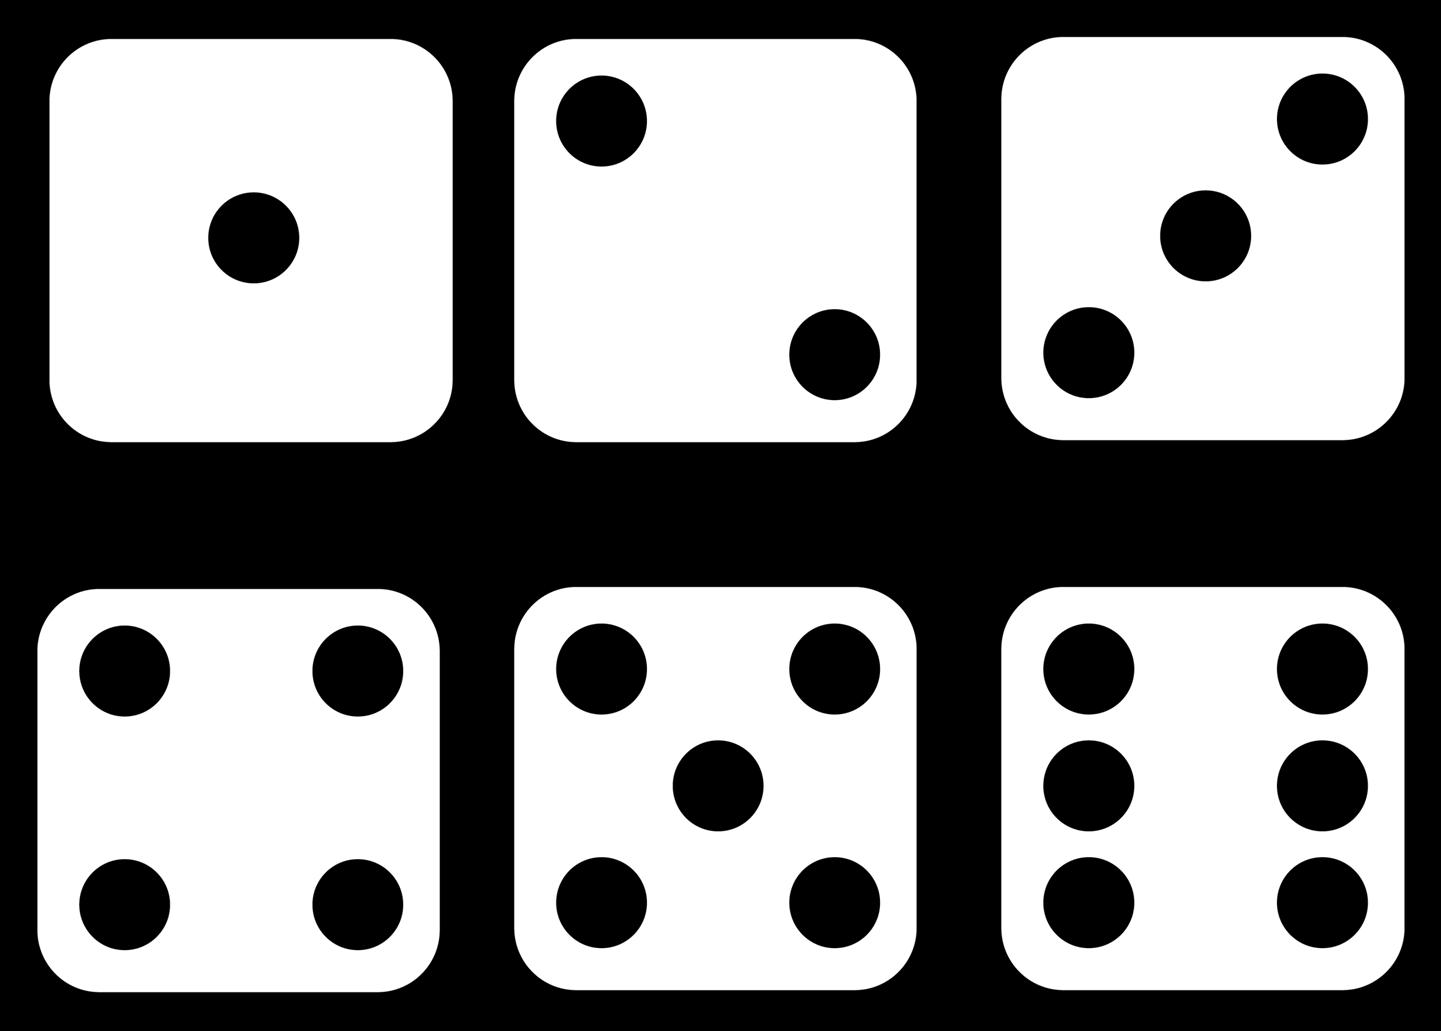 printable dice printable dice clipartsco dice printable